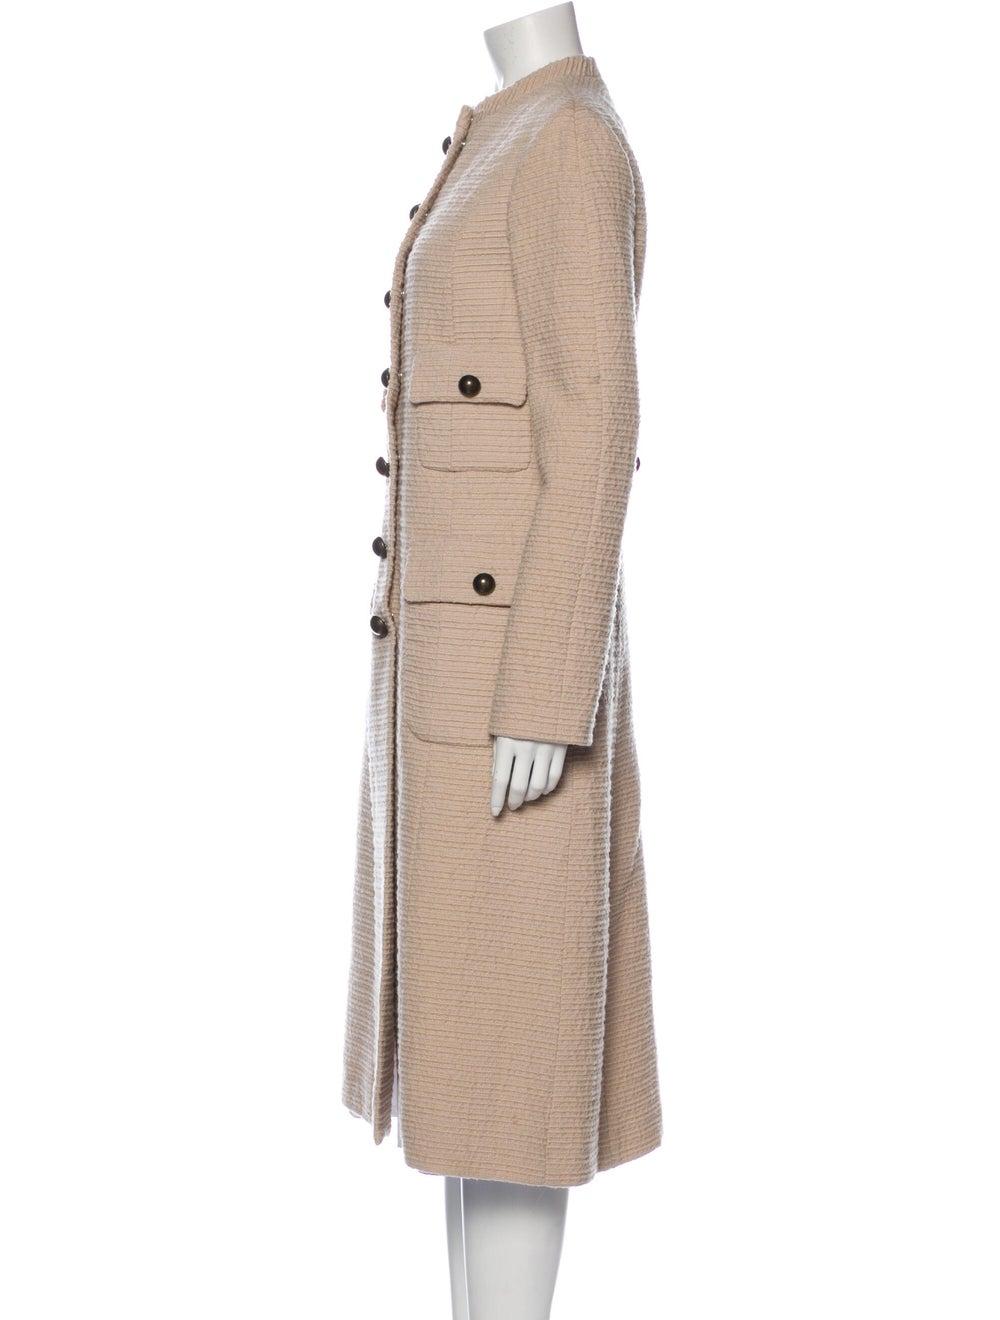 Marc Jacobs Coat - image 2